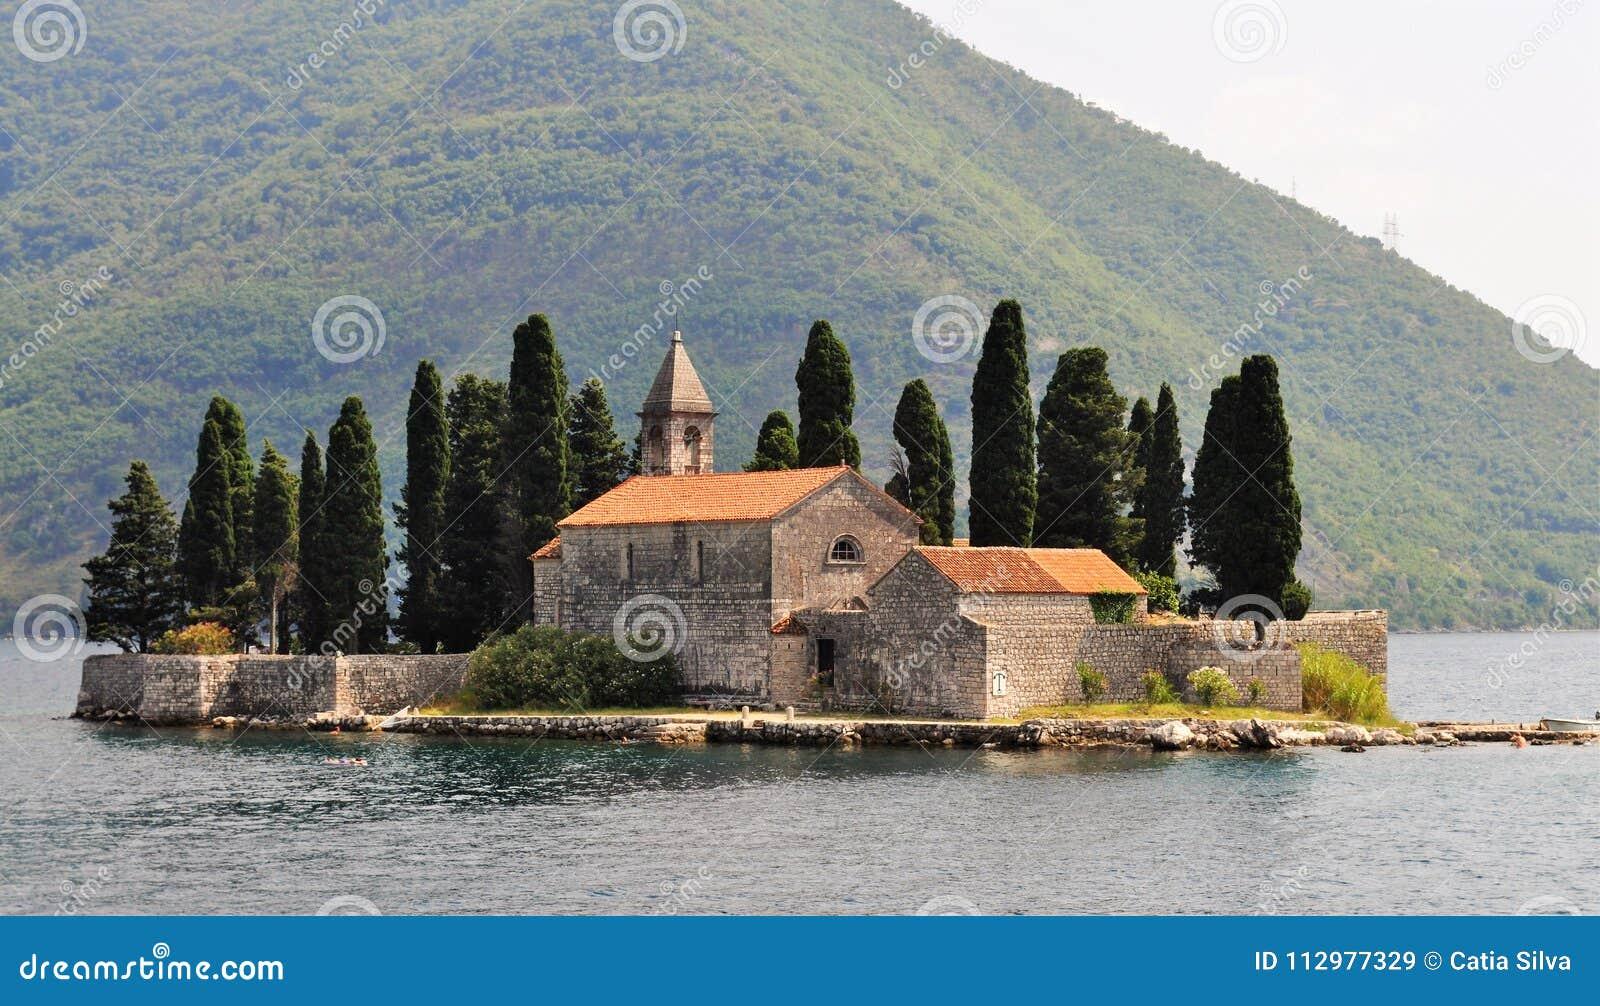 Benedictine monastery at Sveti Dorde island